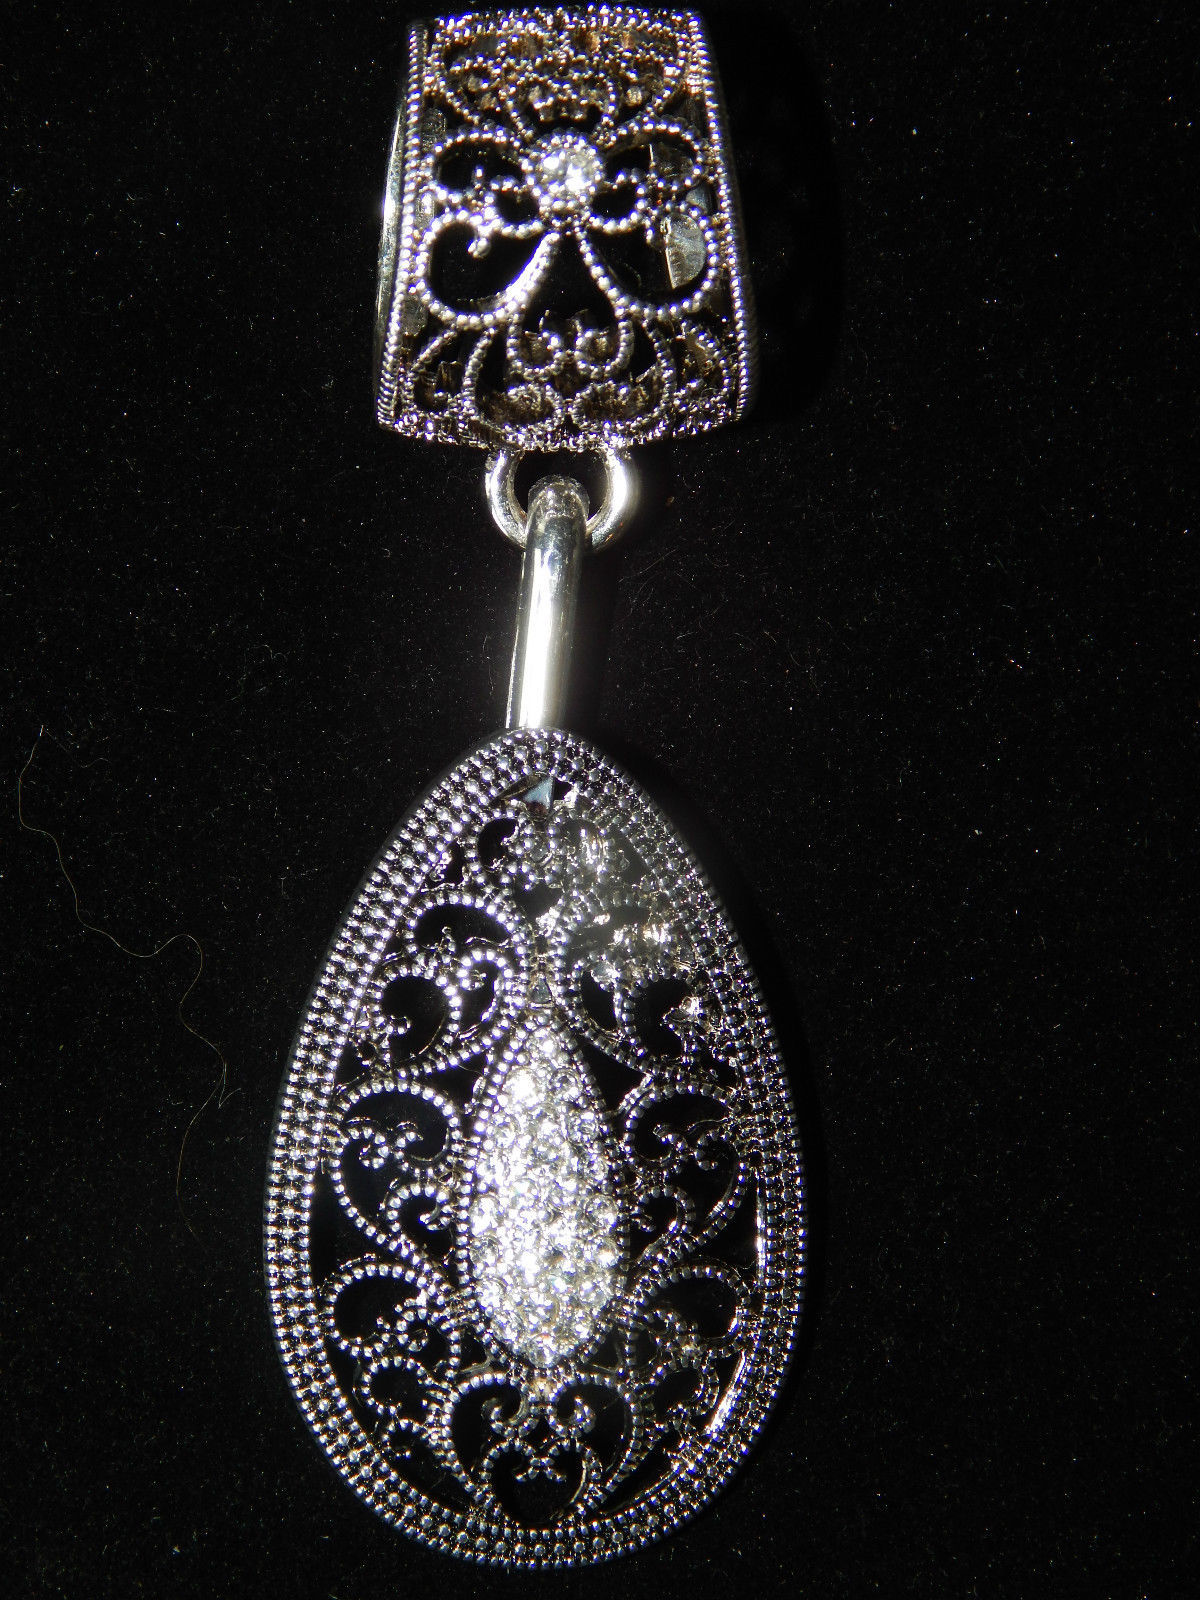 13.67$  Watch here - http://vizlw.justgood.pw/vig/item.php?t=drrxgi47837 - NWT Women's Silver Interchangable Filigree Teardrop Fashion Scarf Ring/Holder 13.67$